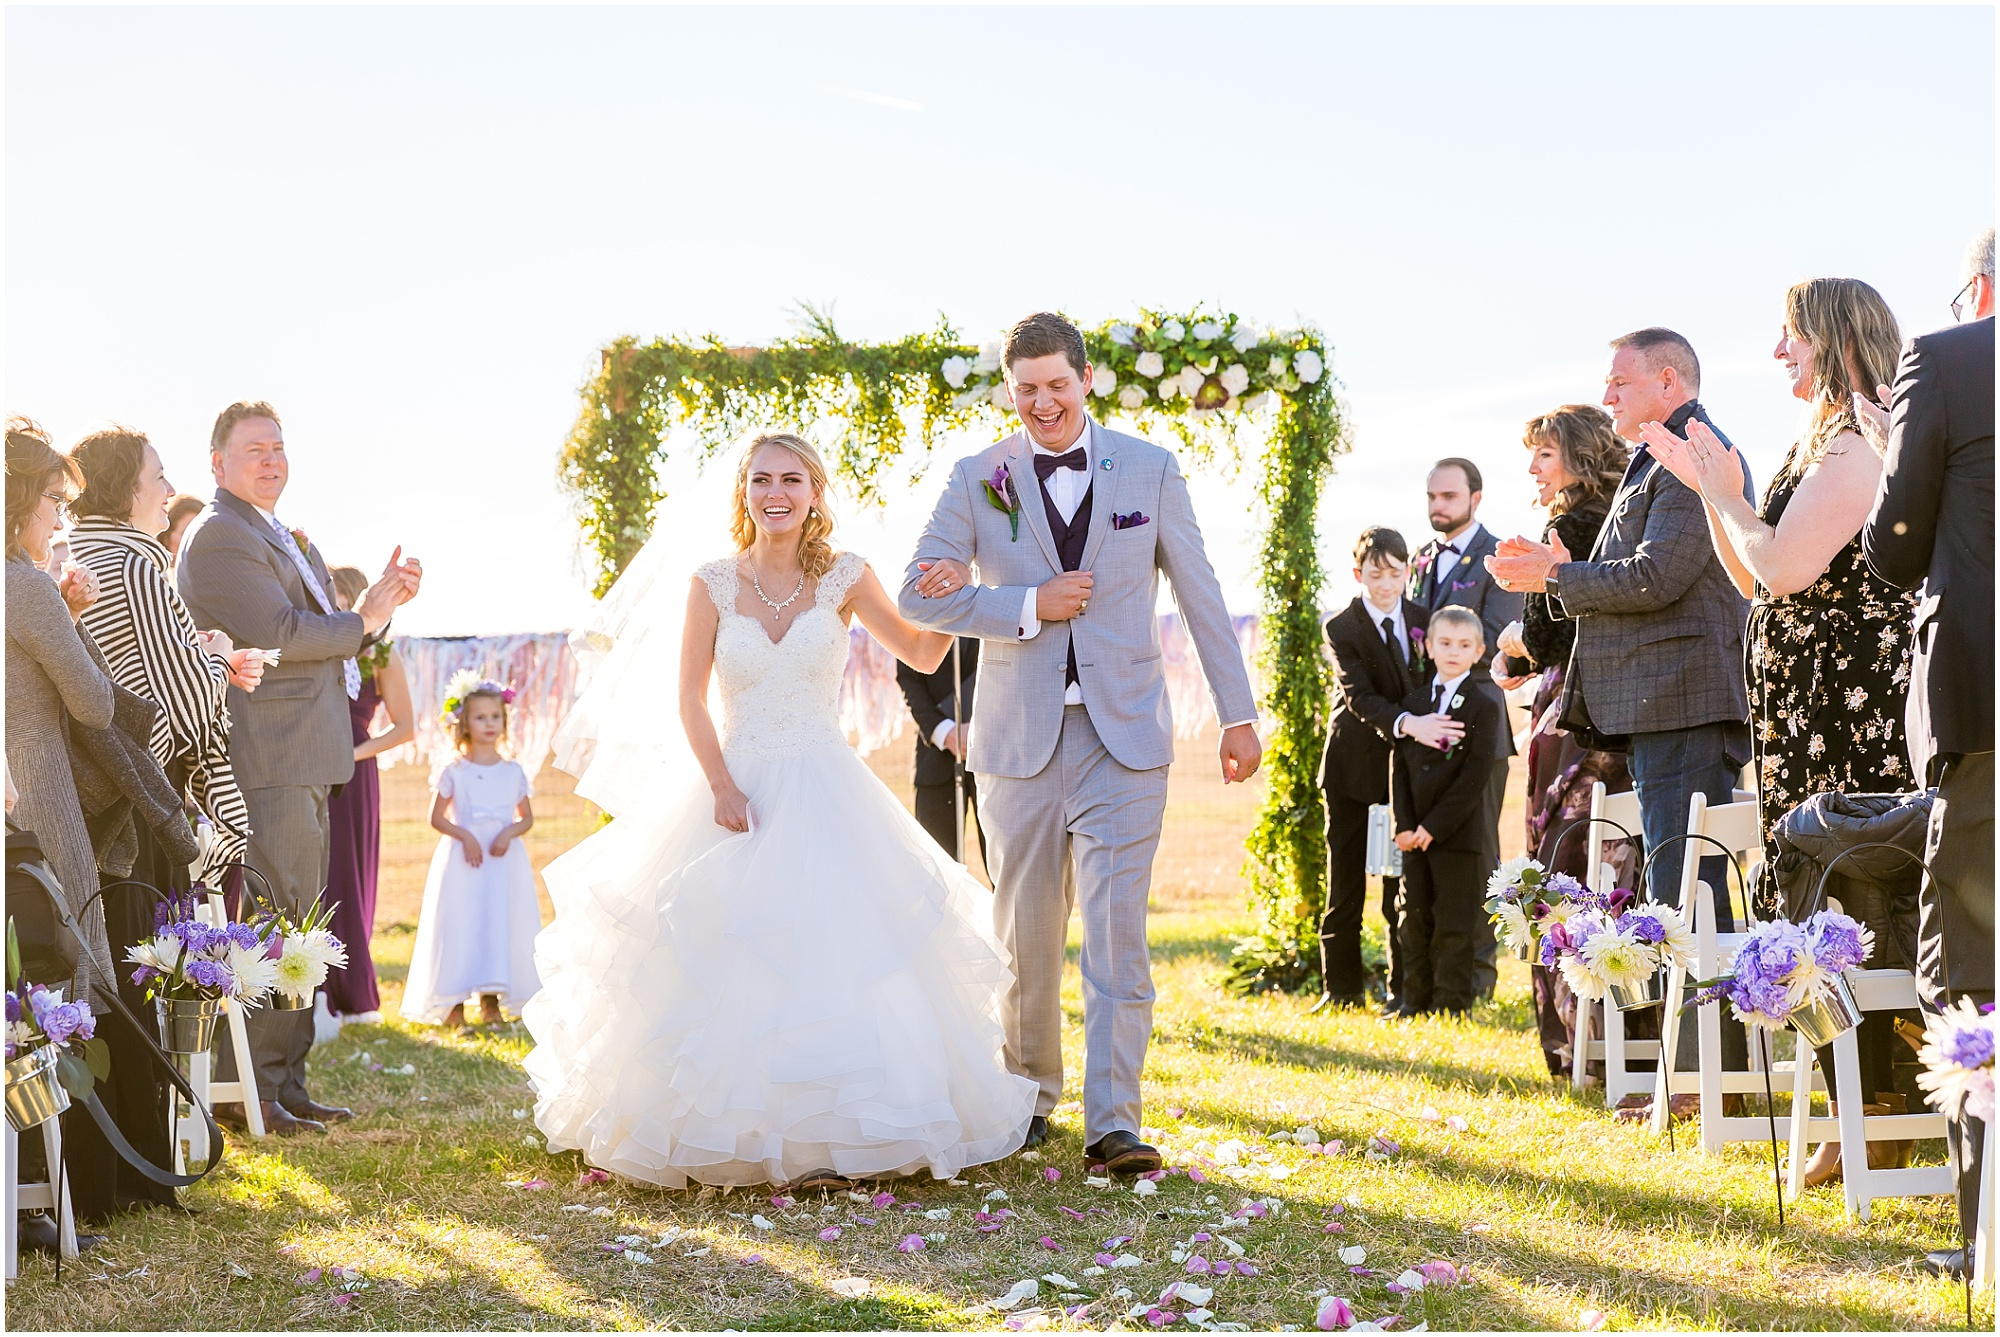 Disney-Inspired-Wedding-Central-Texas_0043.jpg